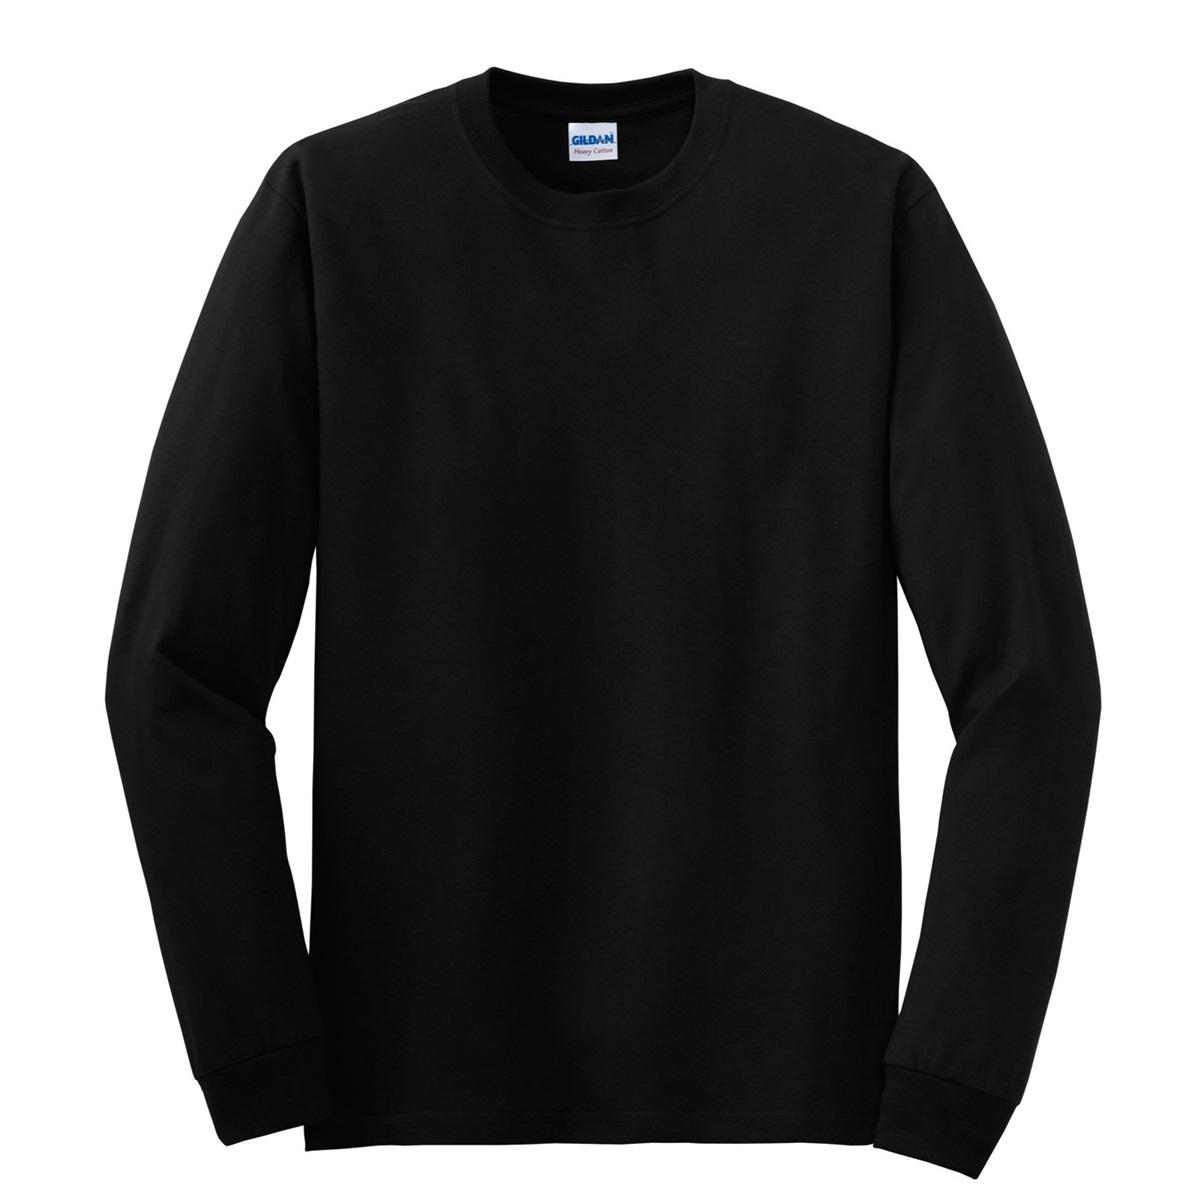 Gildan 5400 heavy cotton long sleeve t shirt black for Black and blue long sleeve shirt